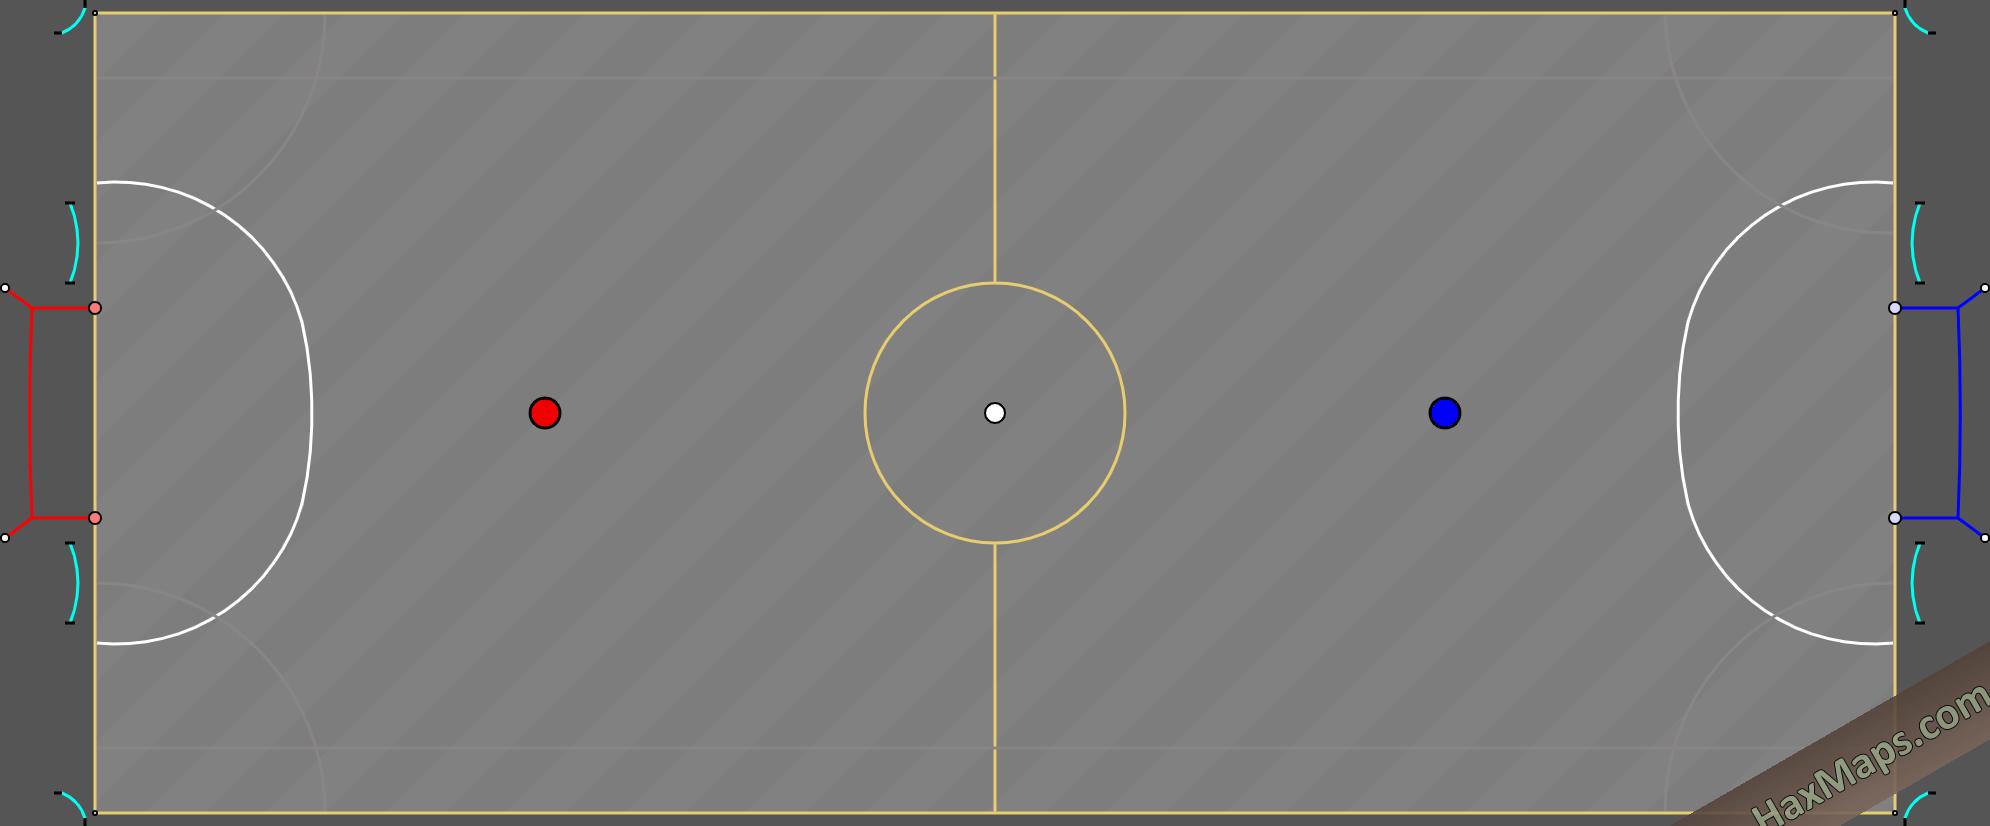 haxball maps | Real Futsal vS